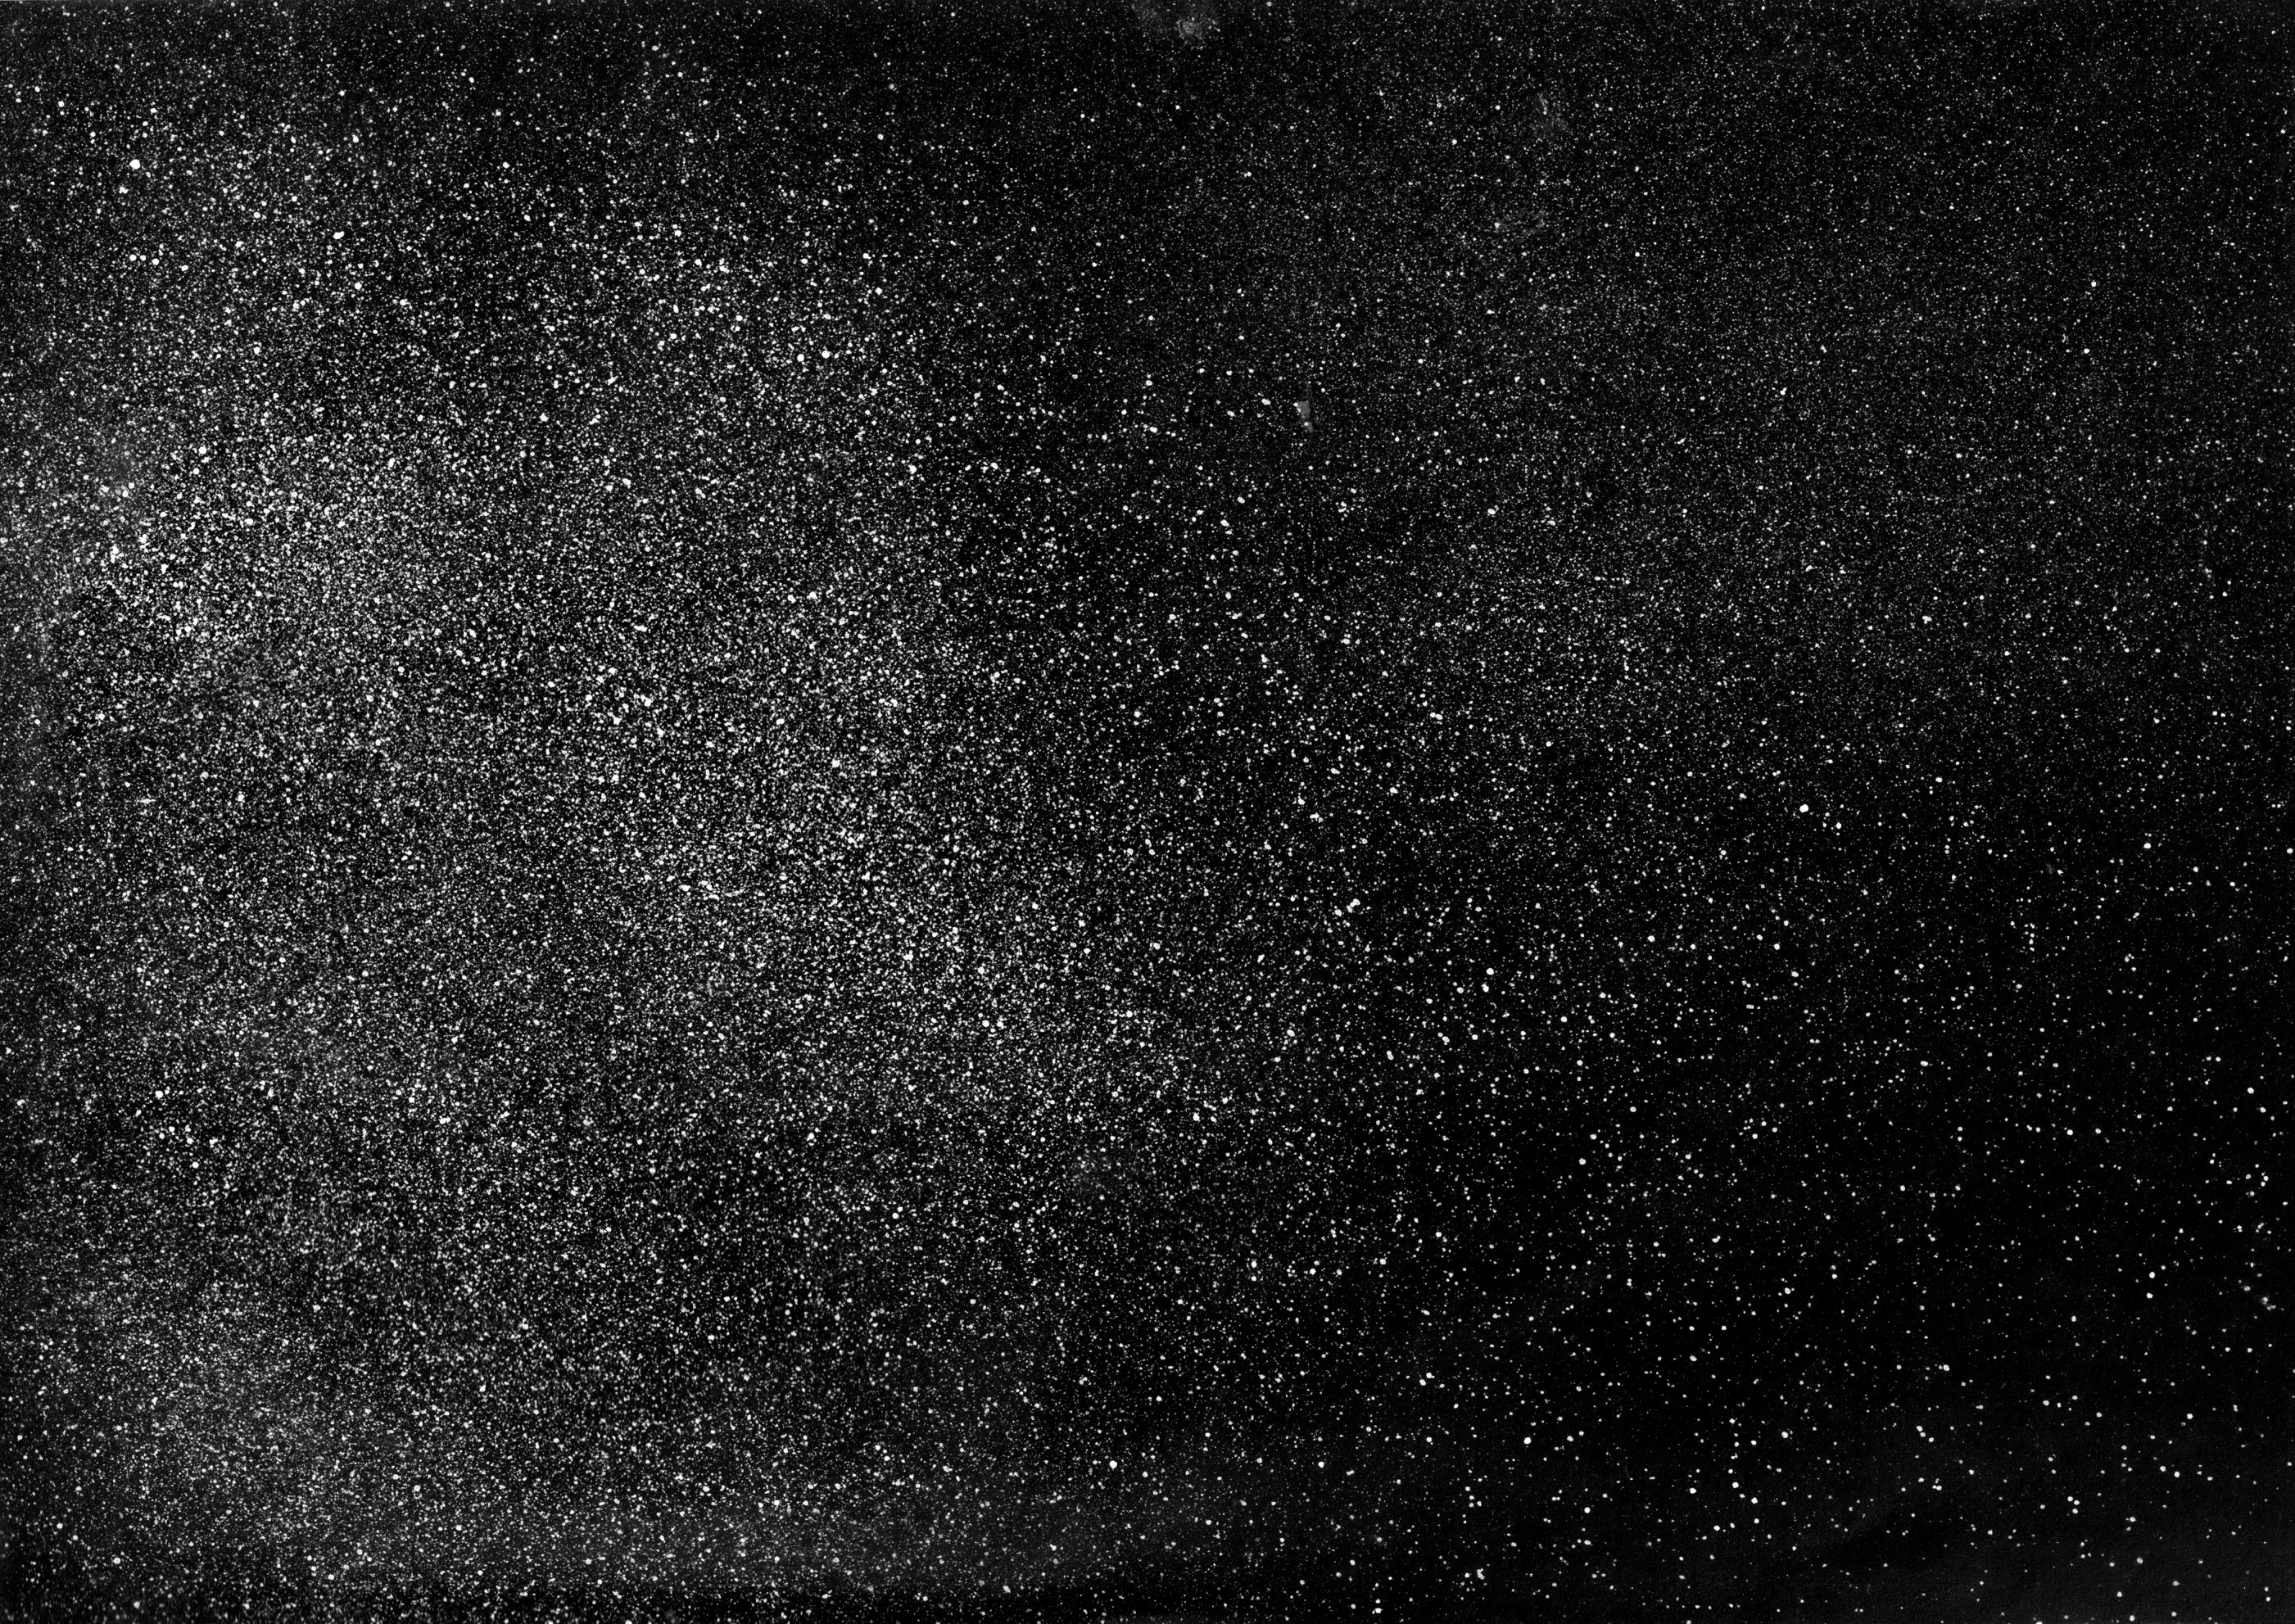 3d Water Drop Wallpaper 6 Sprayed Textures Texture Fabrik